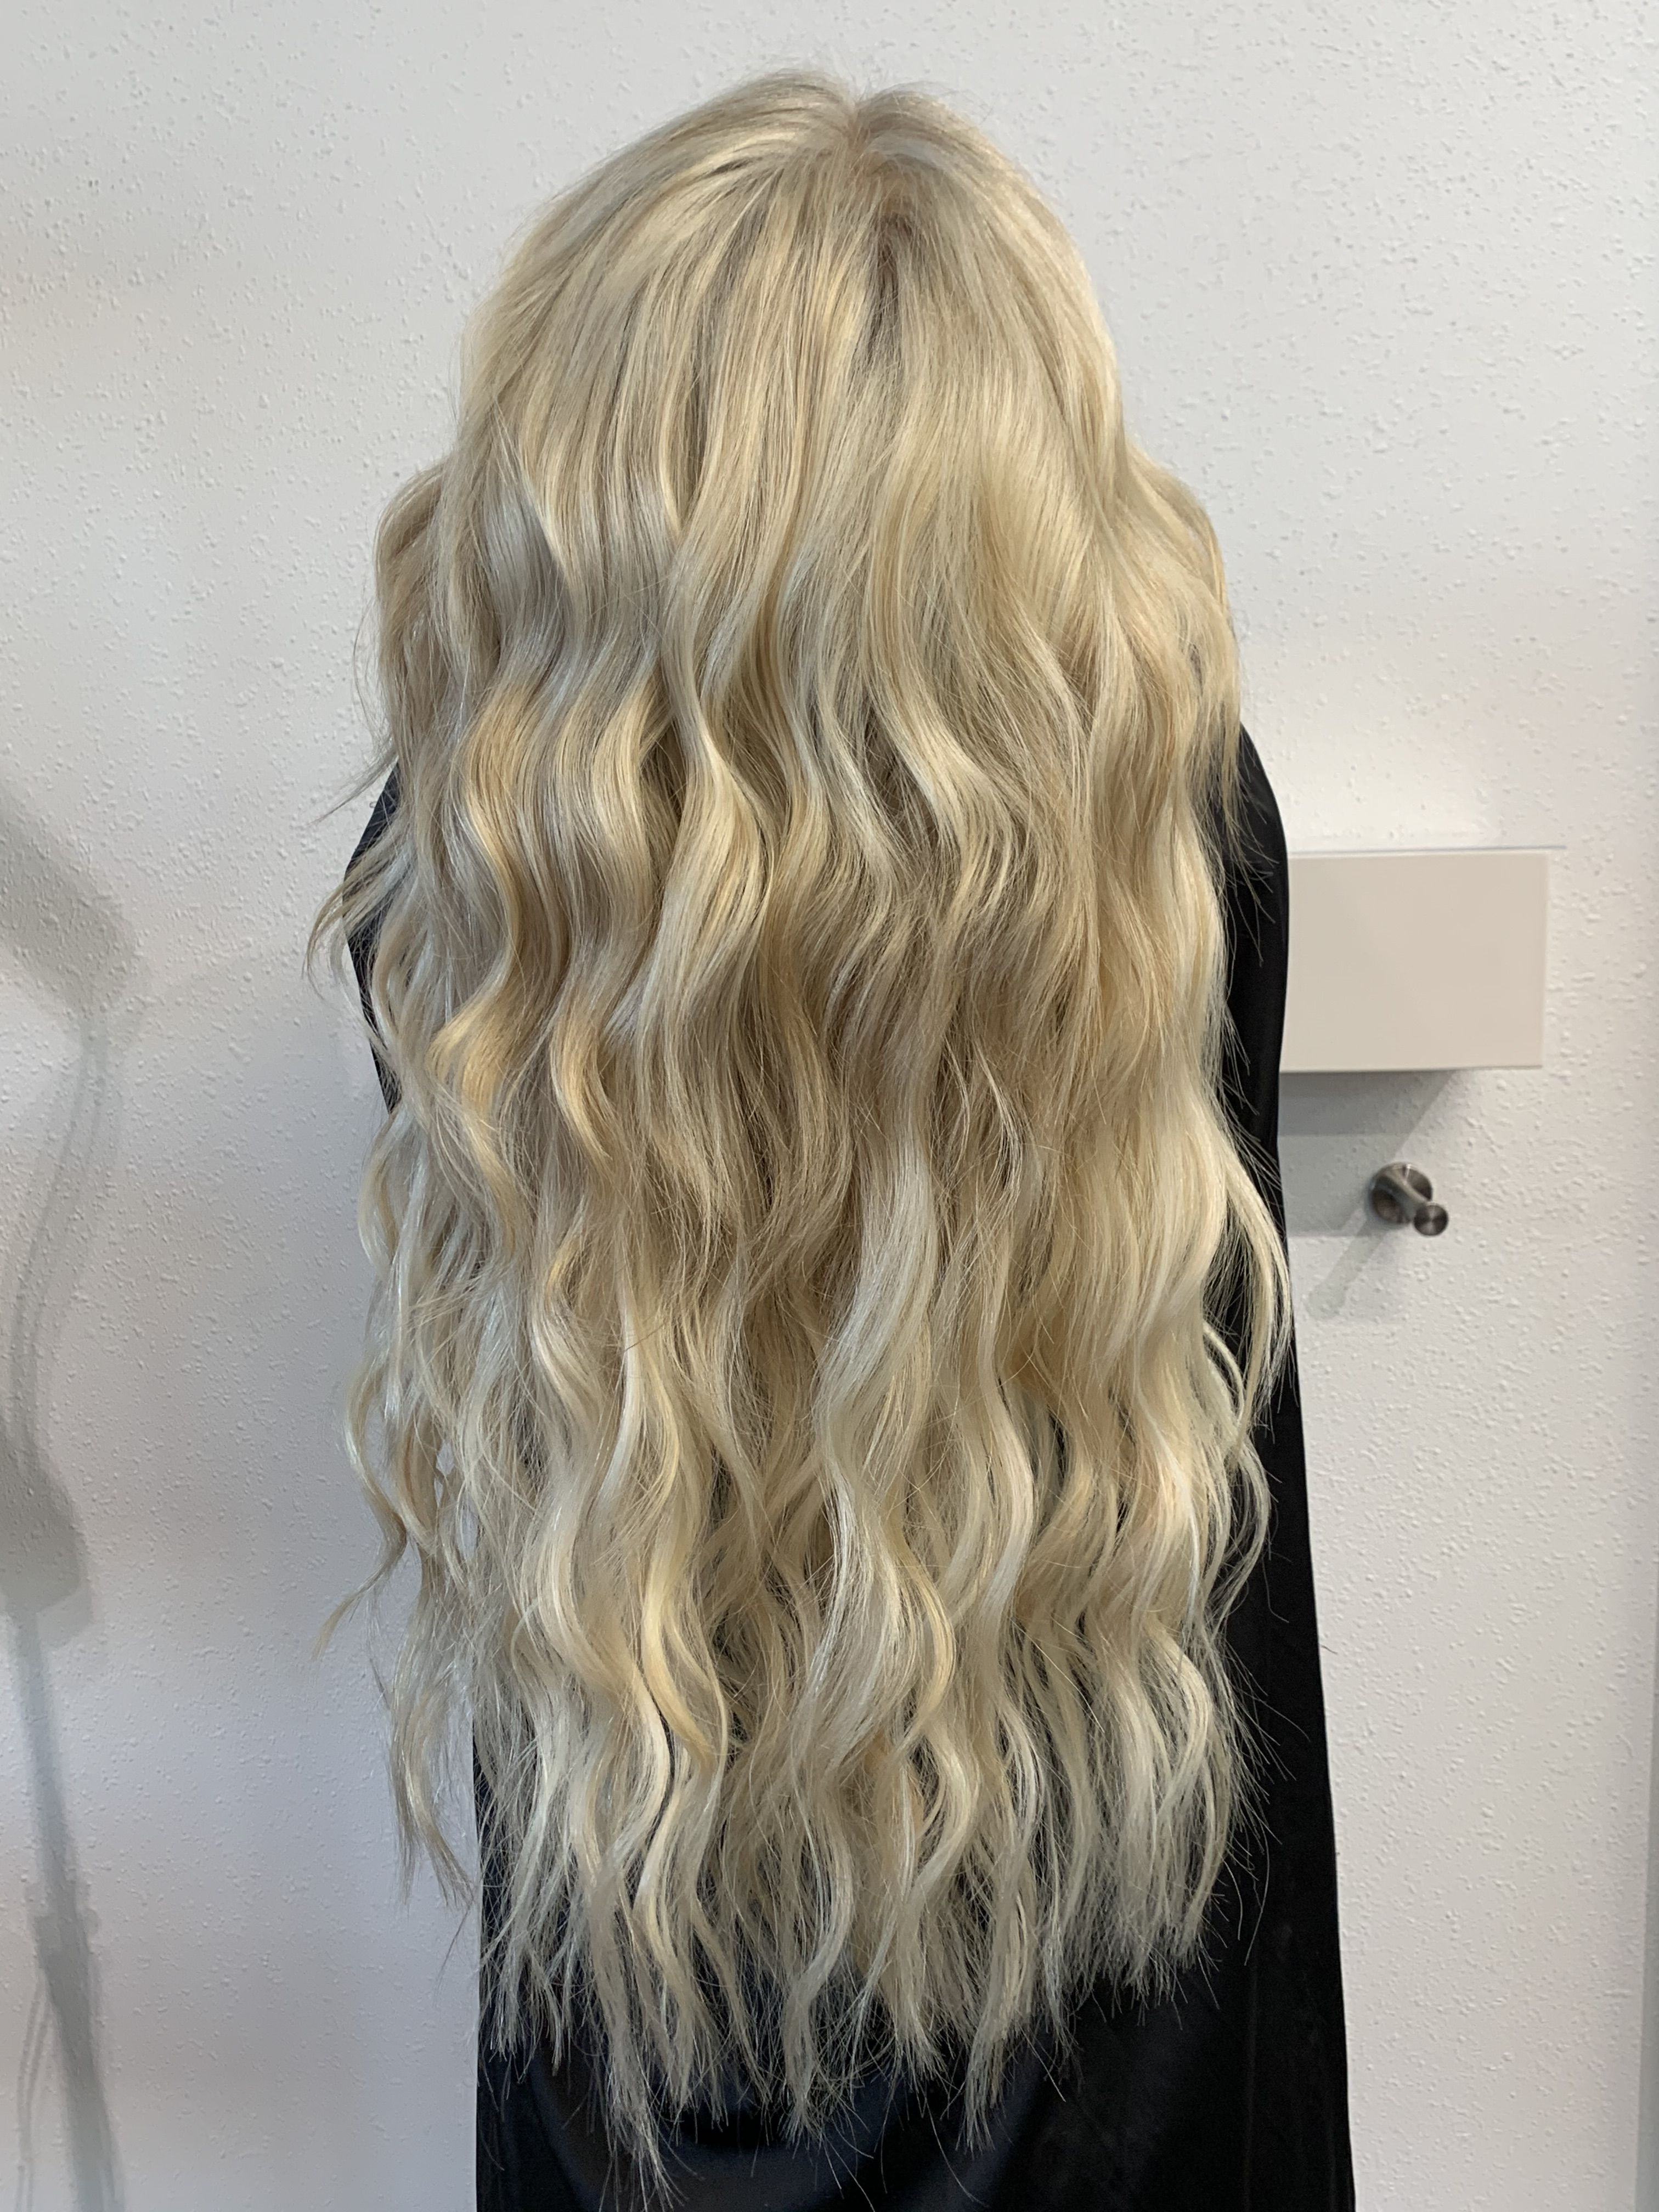 24 Bellami Hair Hair Studio Long Hair Styles Hair